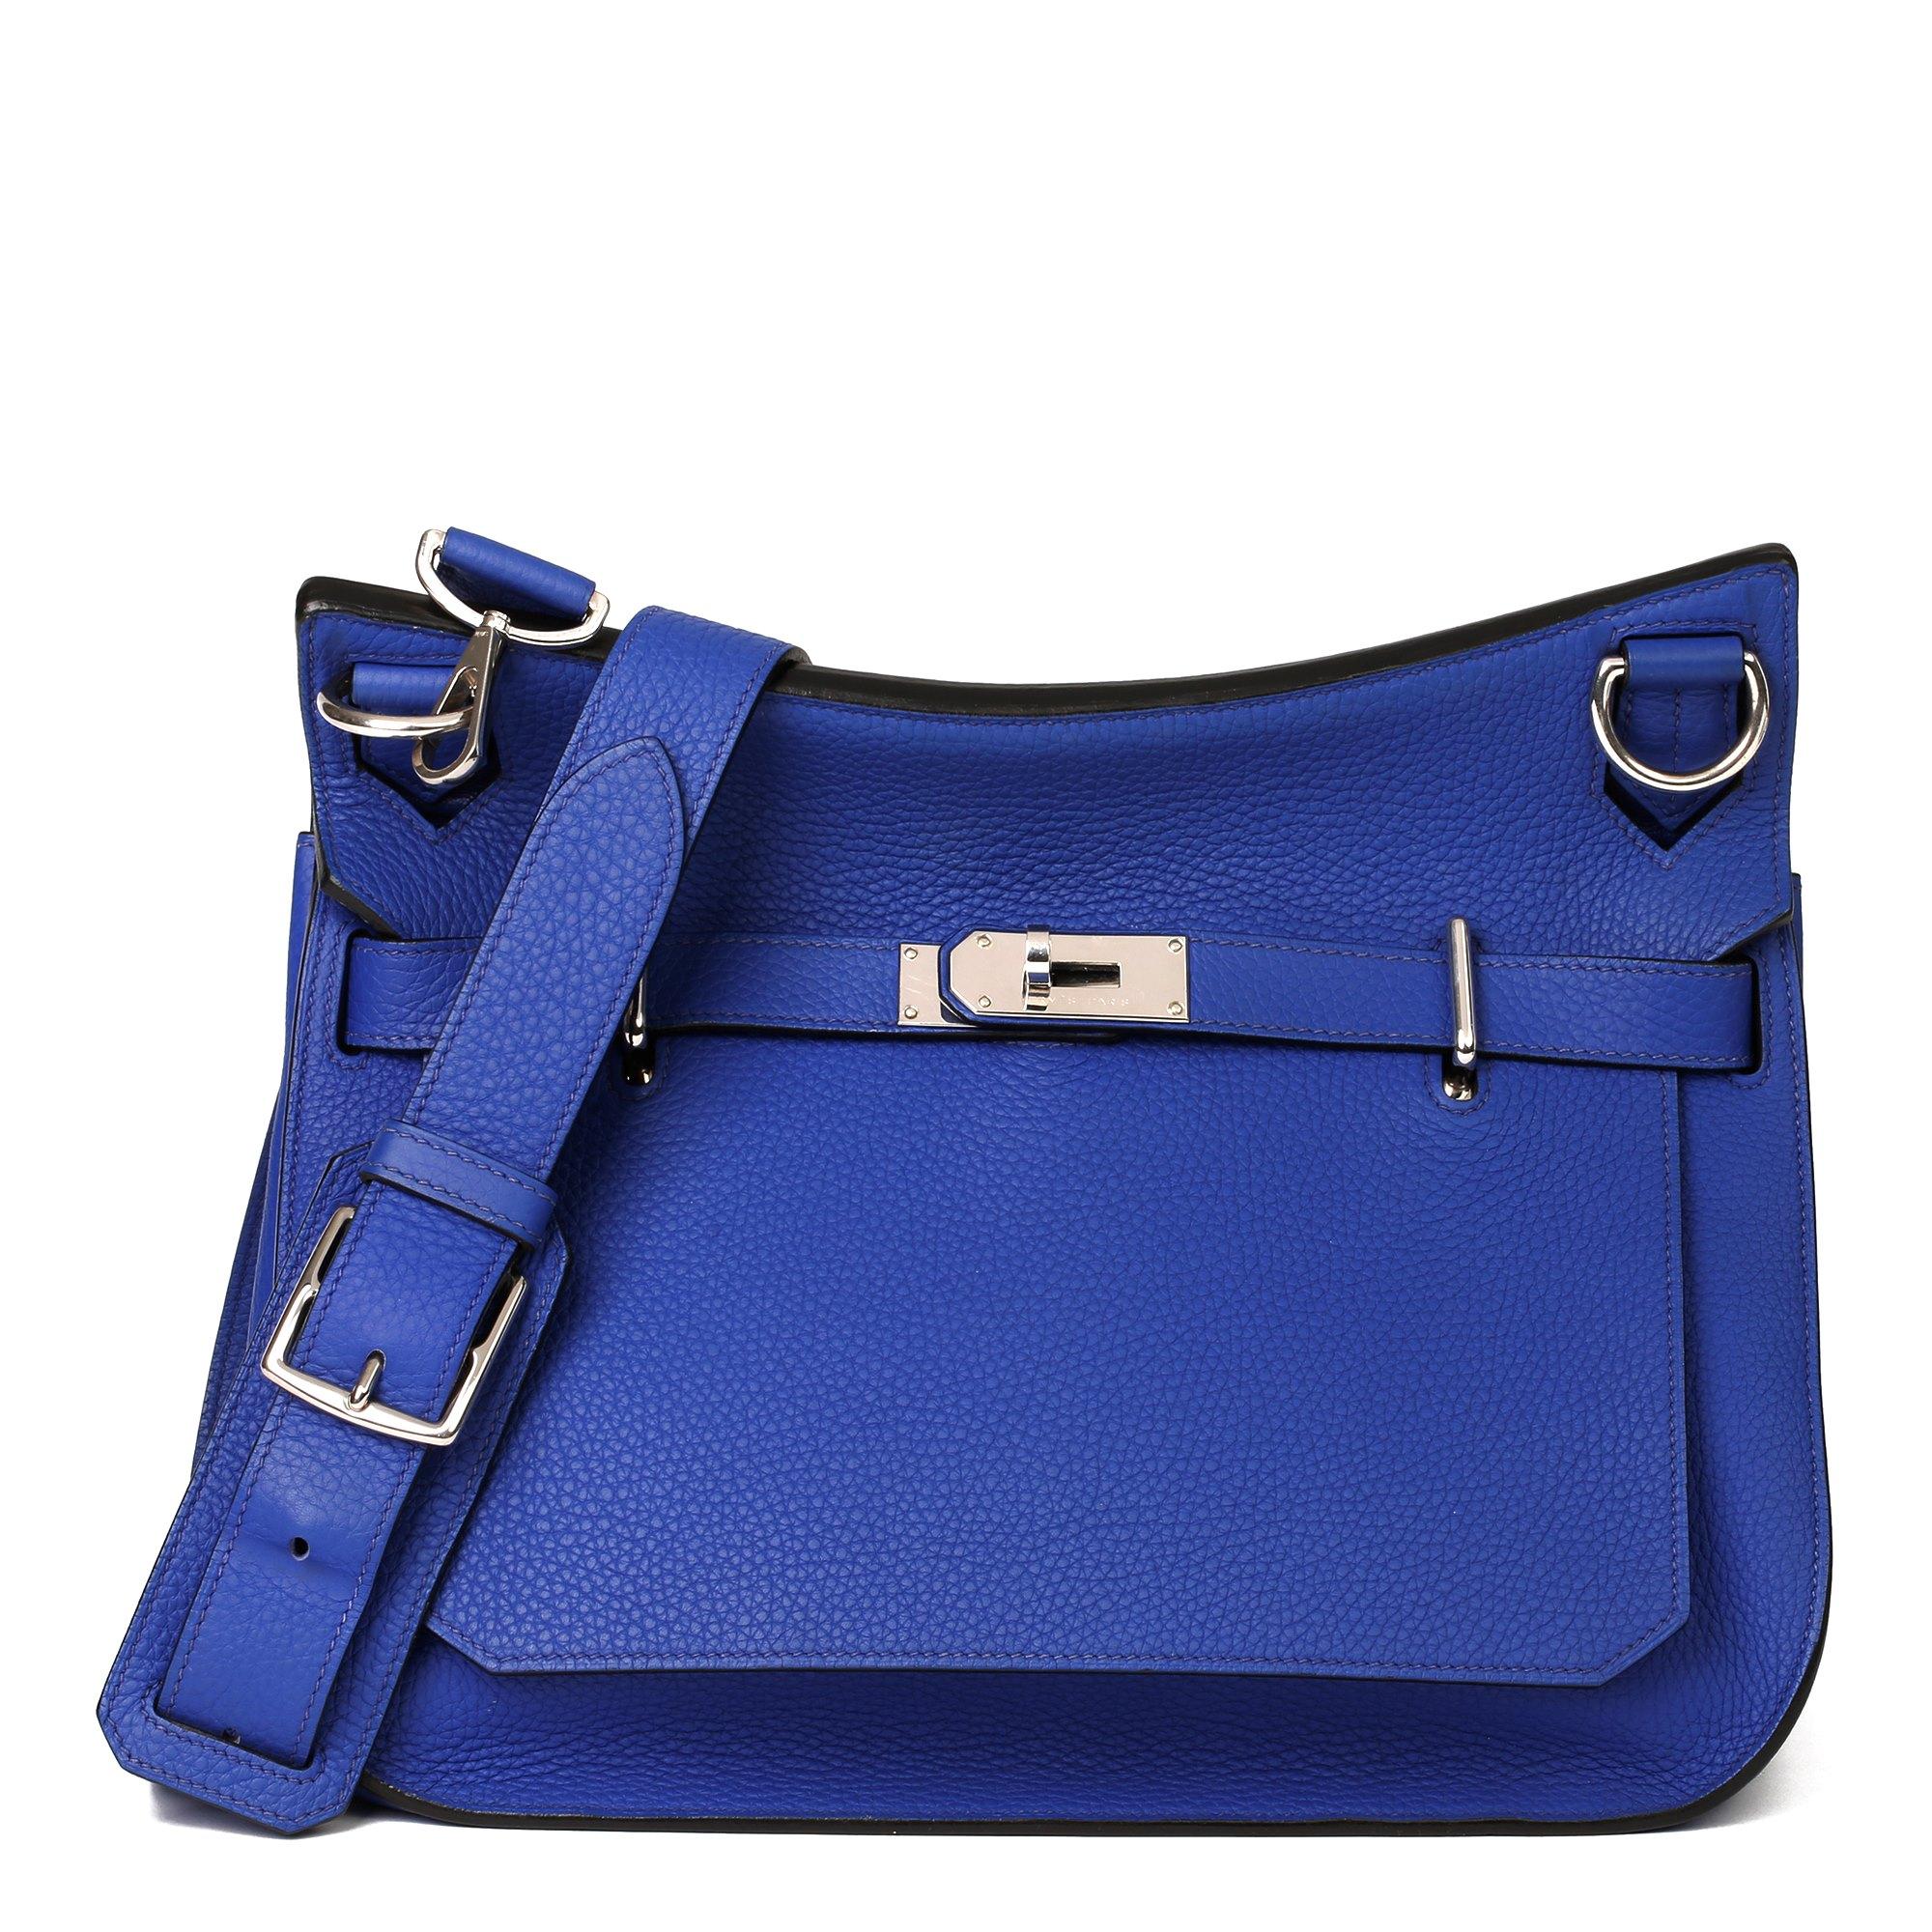 Hermès Blue Electric Clemence Leather Jypsiere 34